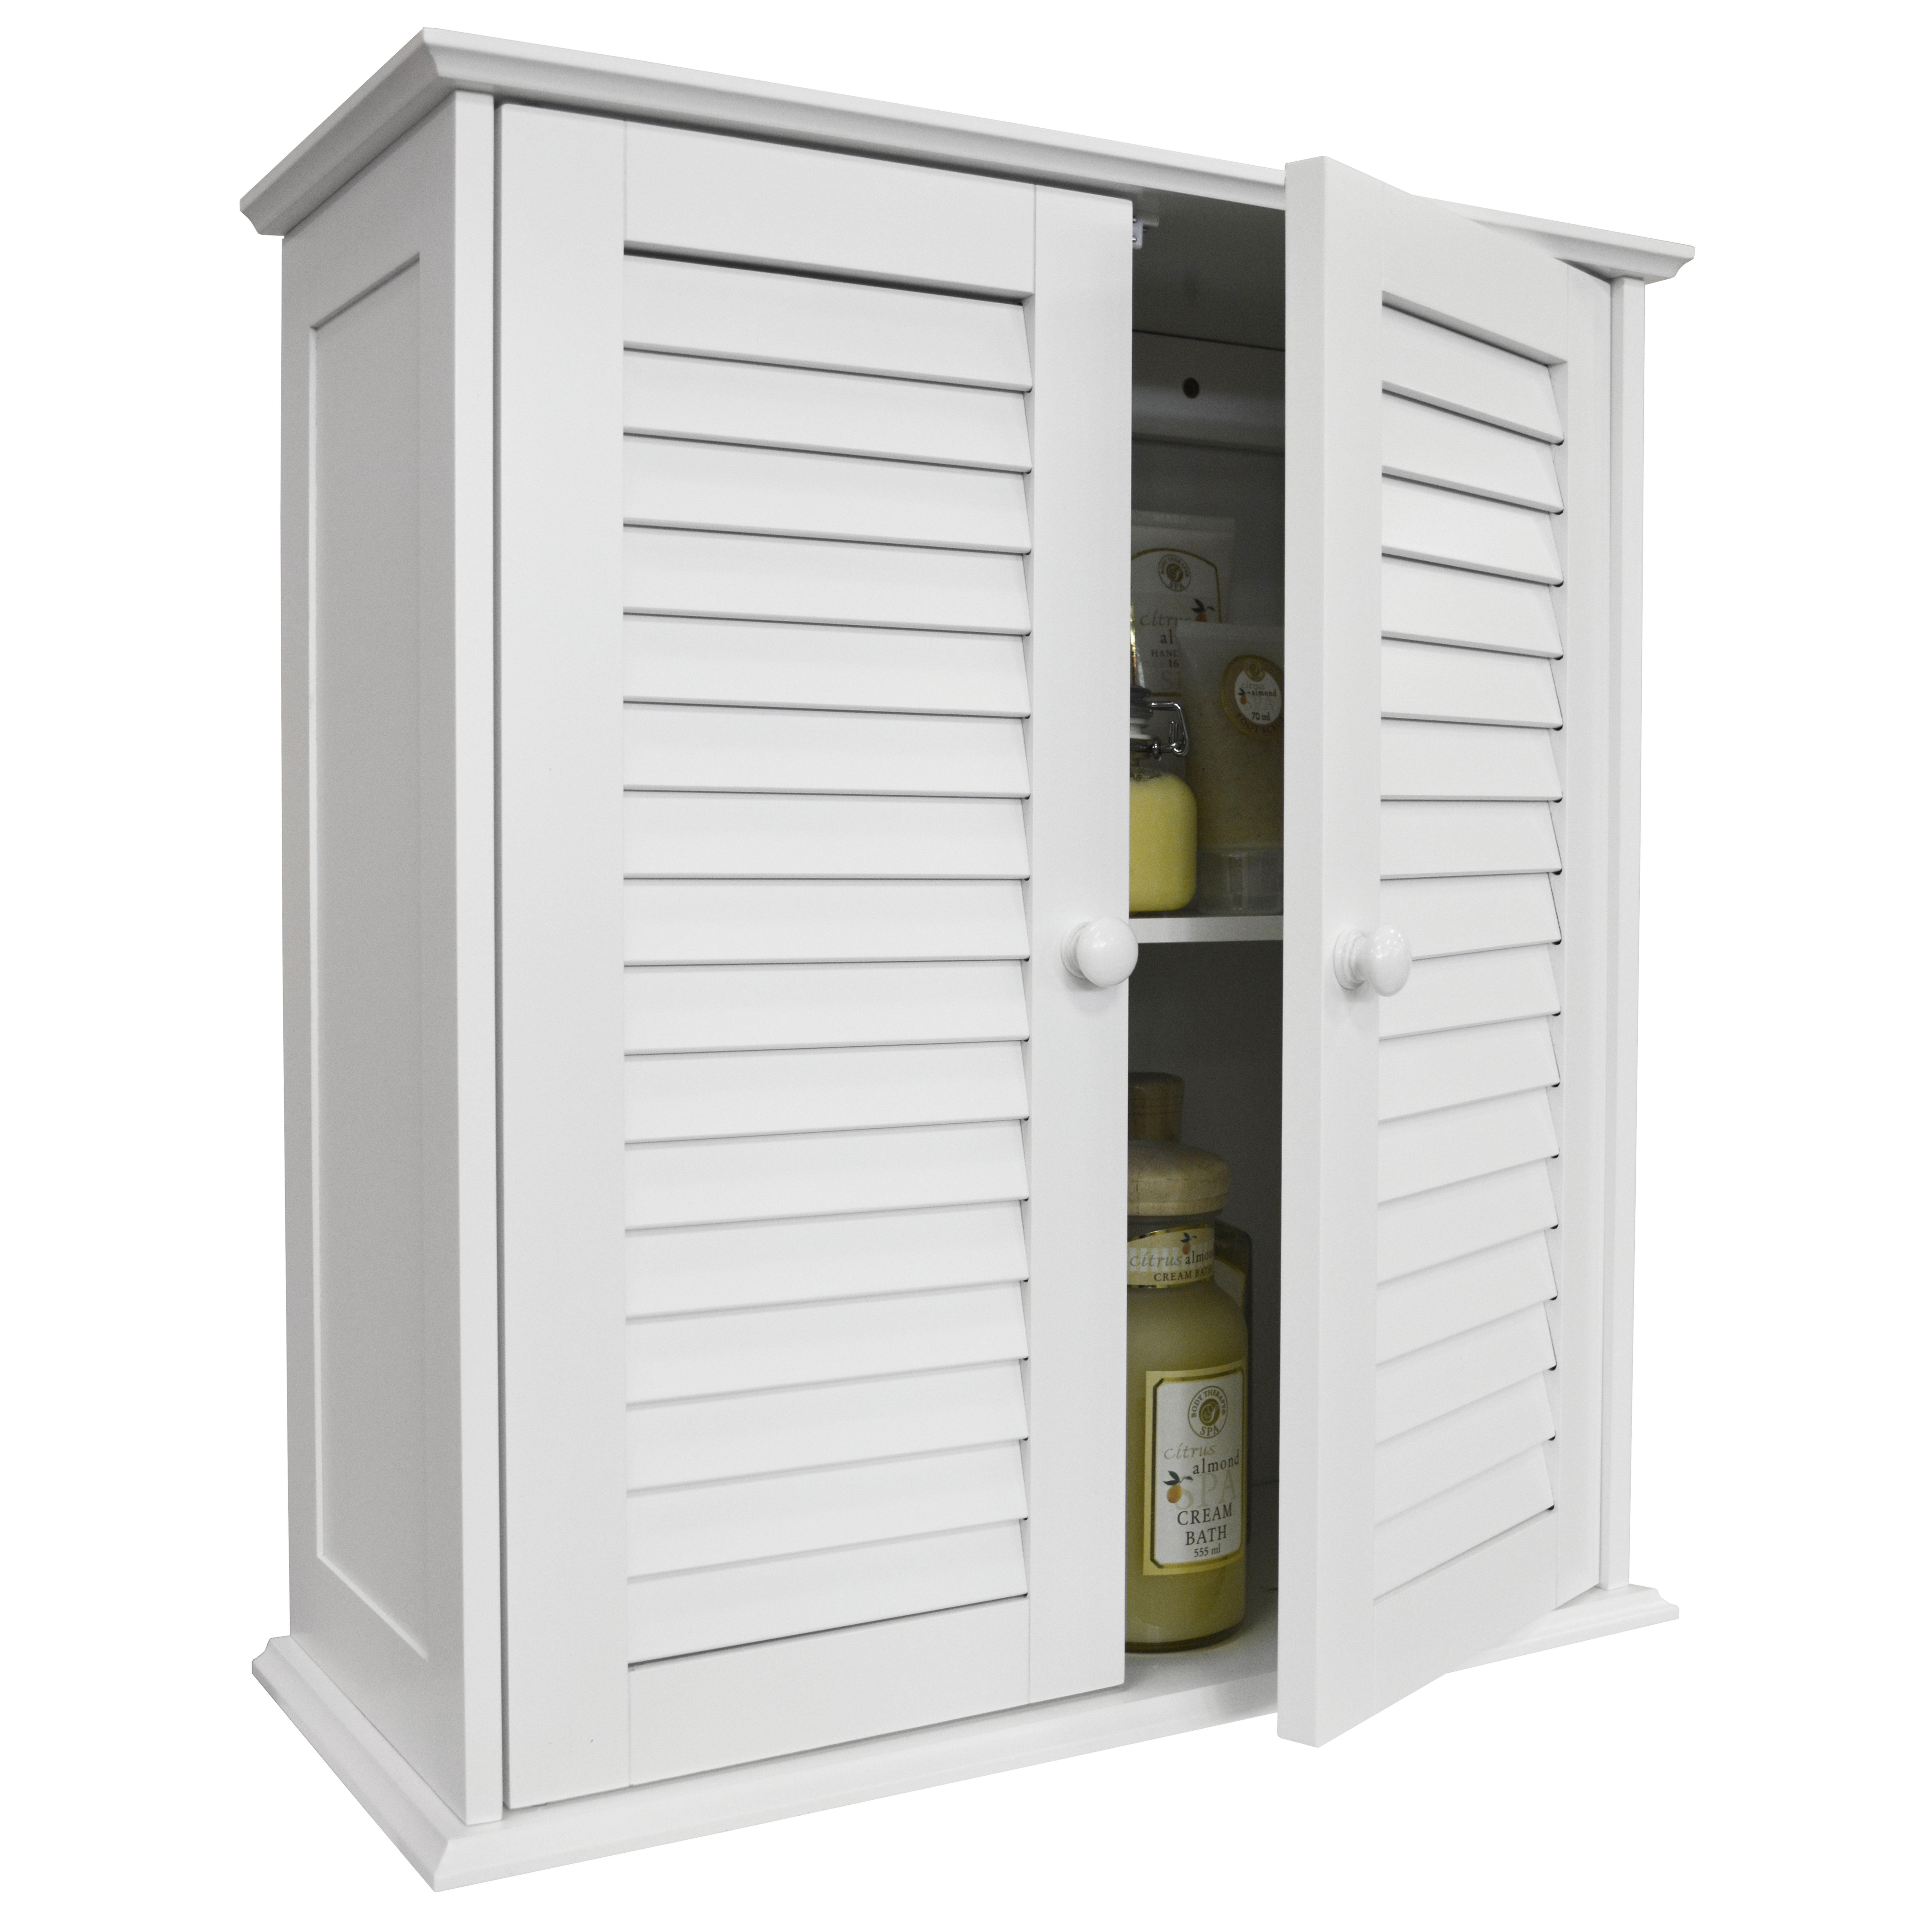 LOUVRE - Double Shutter Door Bathroom Wall Storage Cabinet - White ...